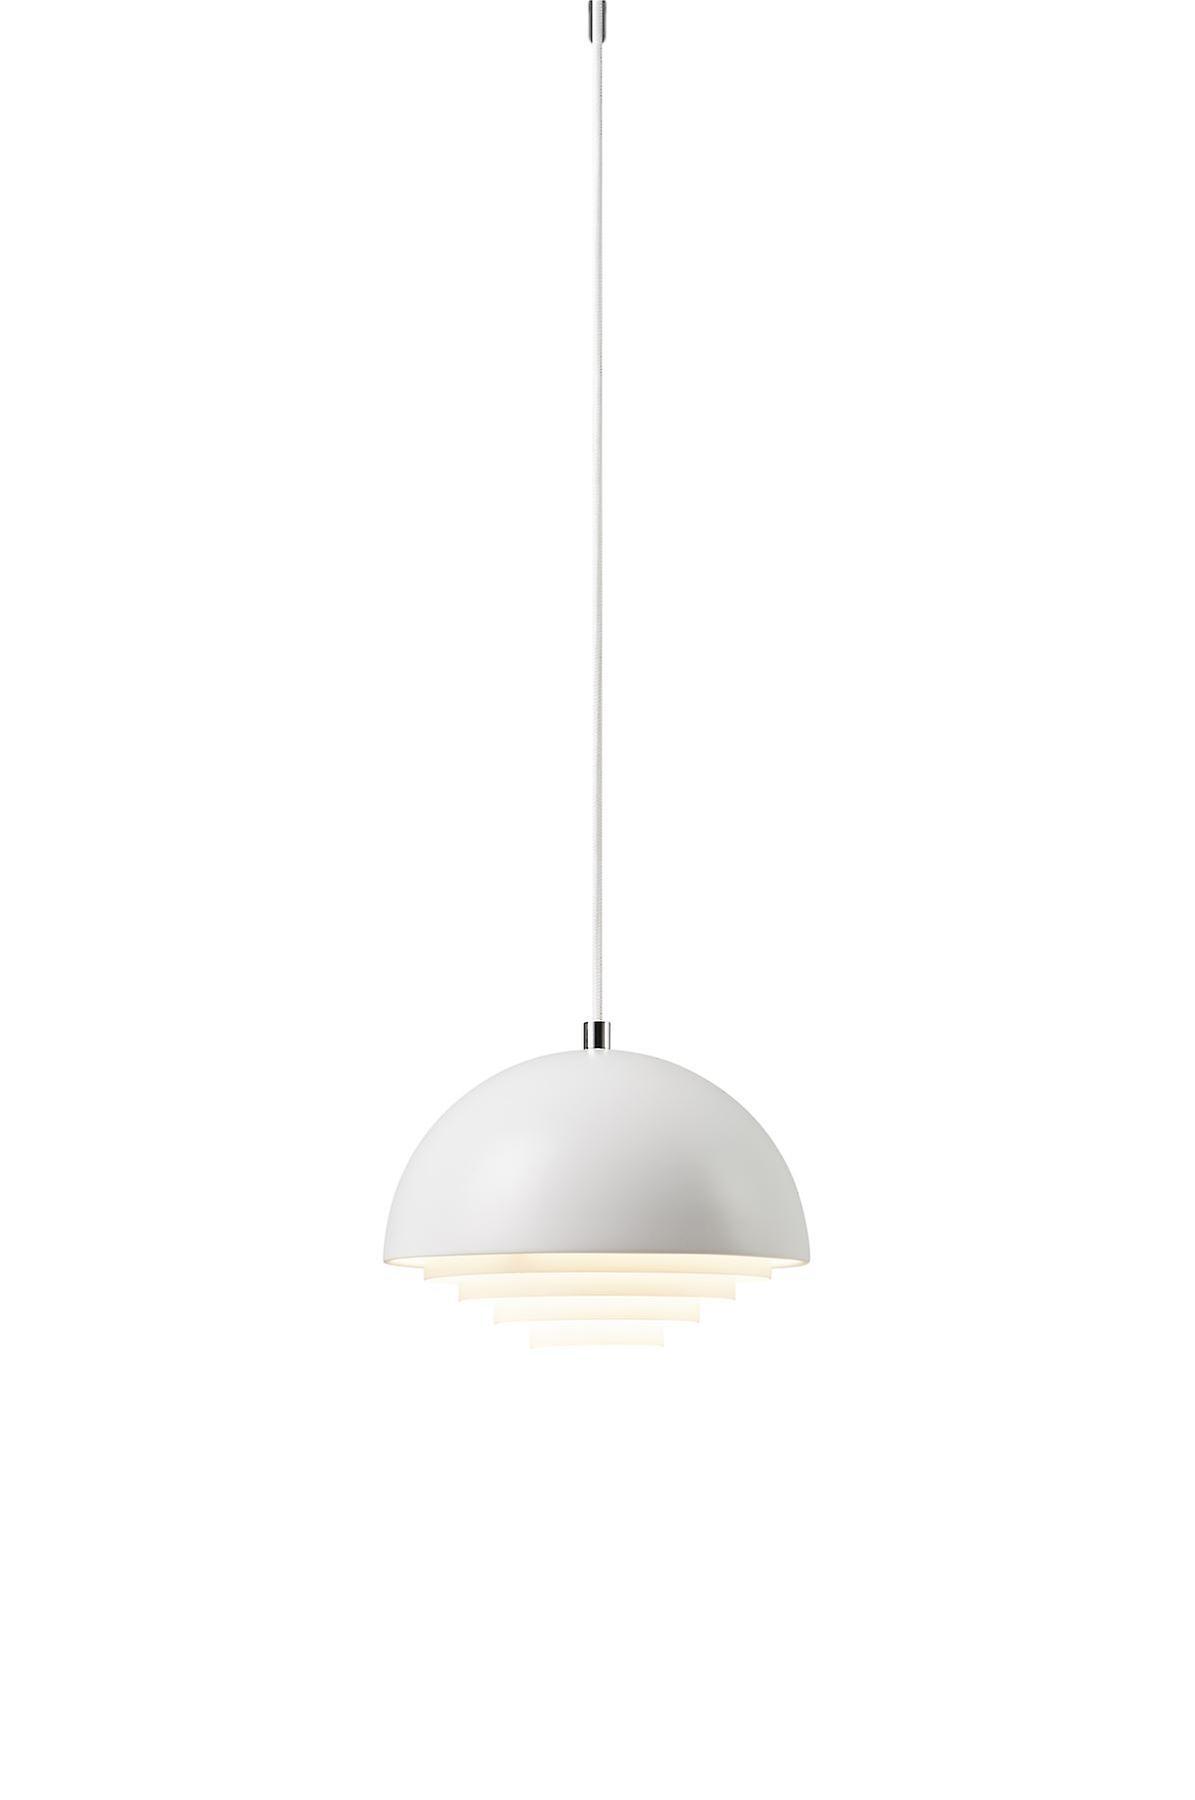 Herstal - Motown LED pendentif lumière blanc Finish 6007225020